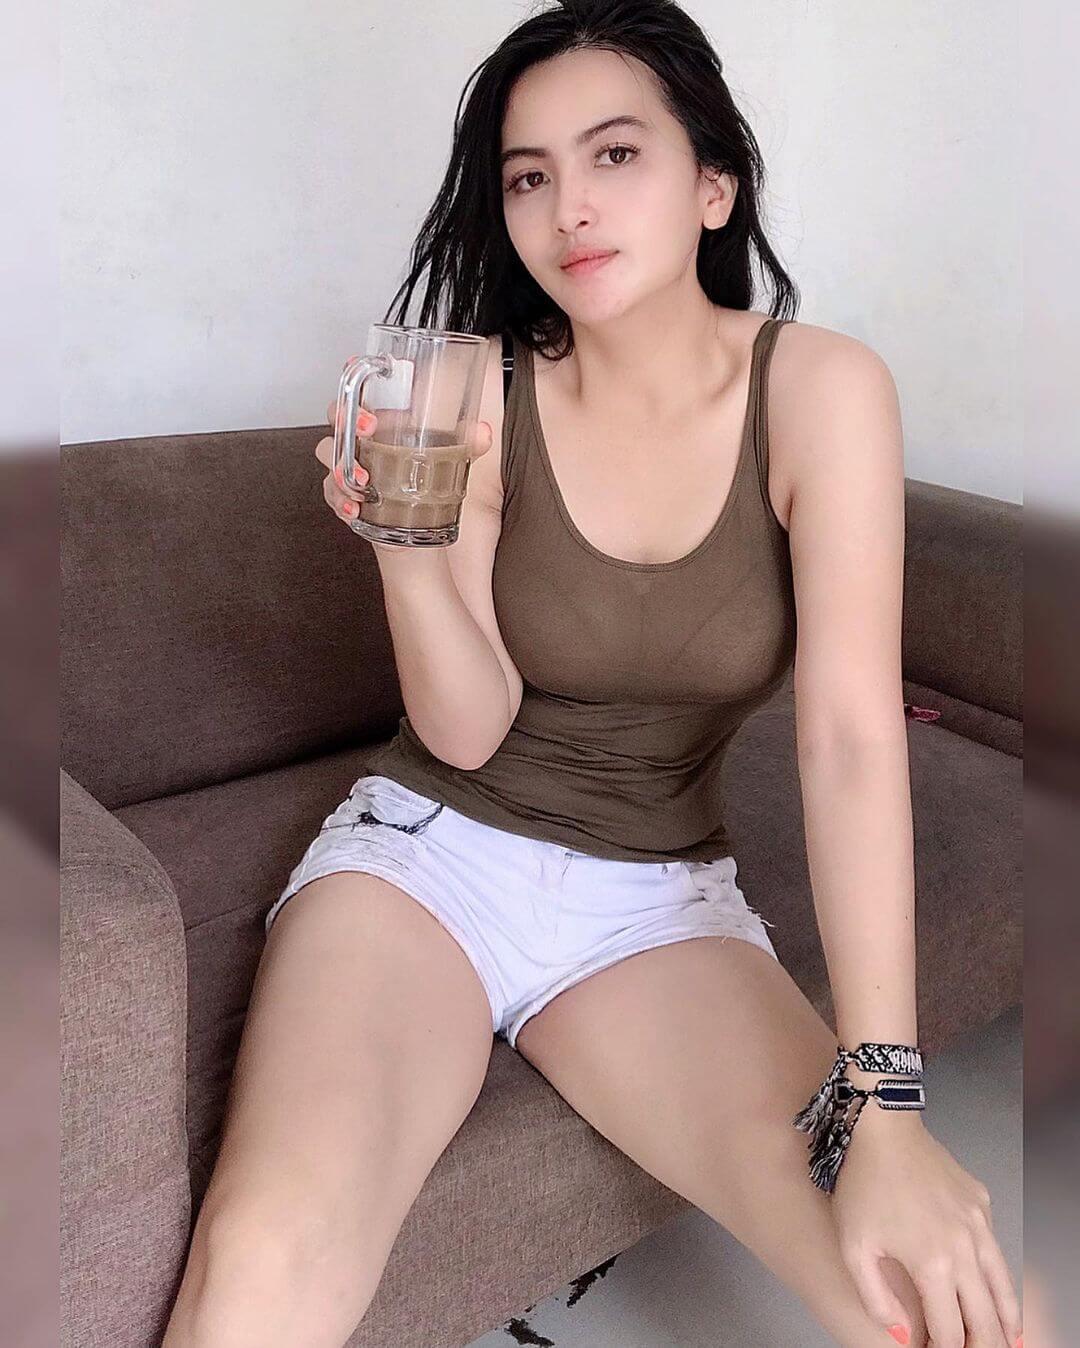 Dianna Dee Starlight Holding Glass Of Coffee